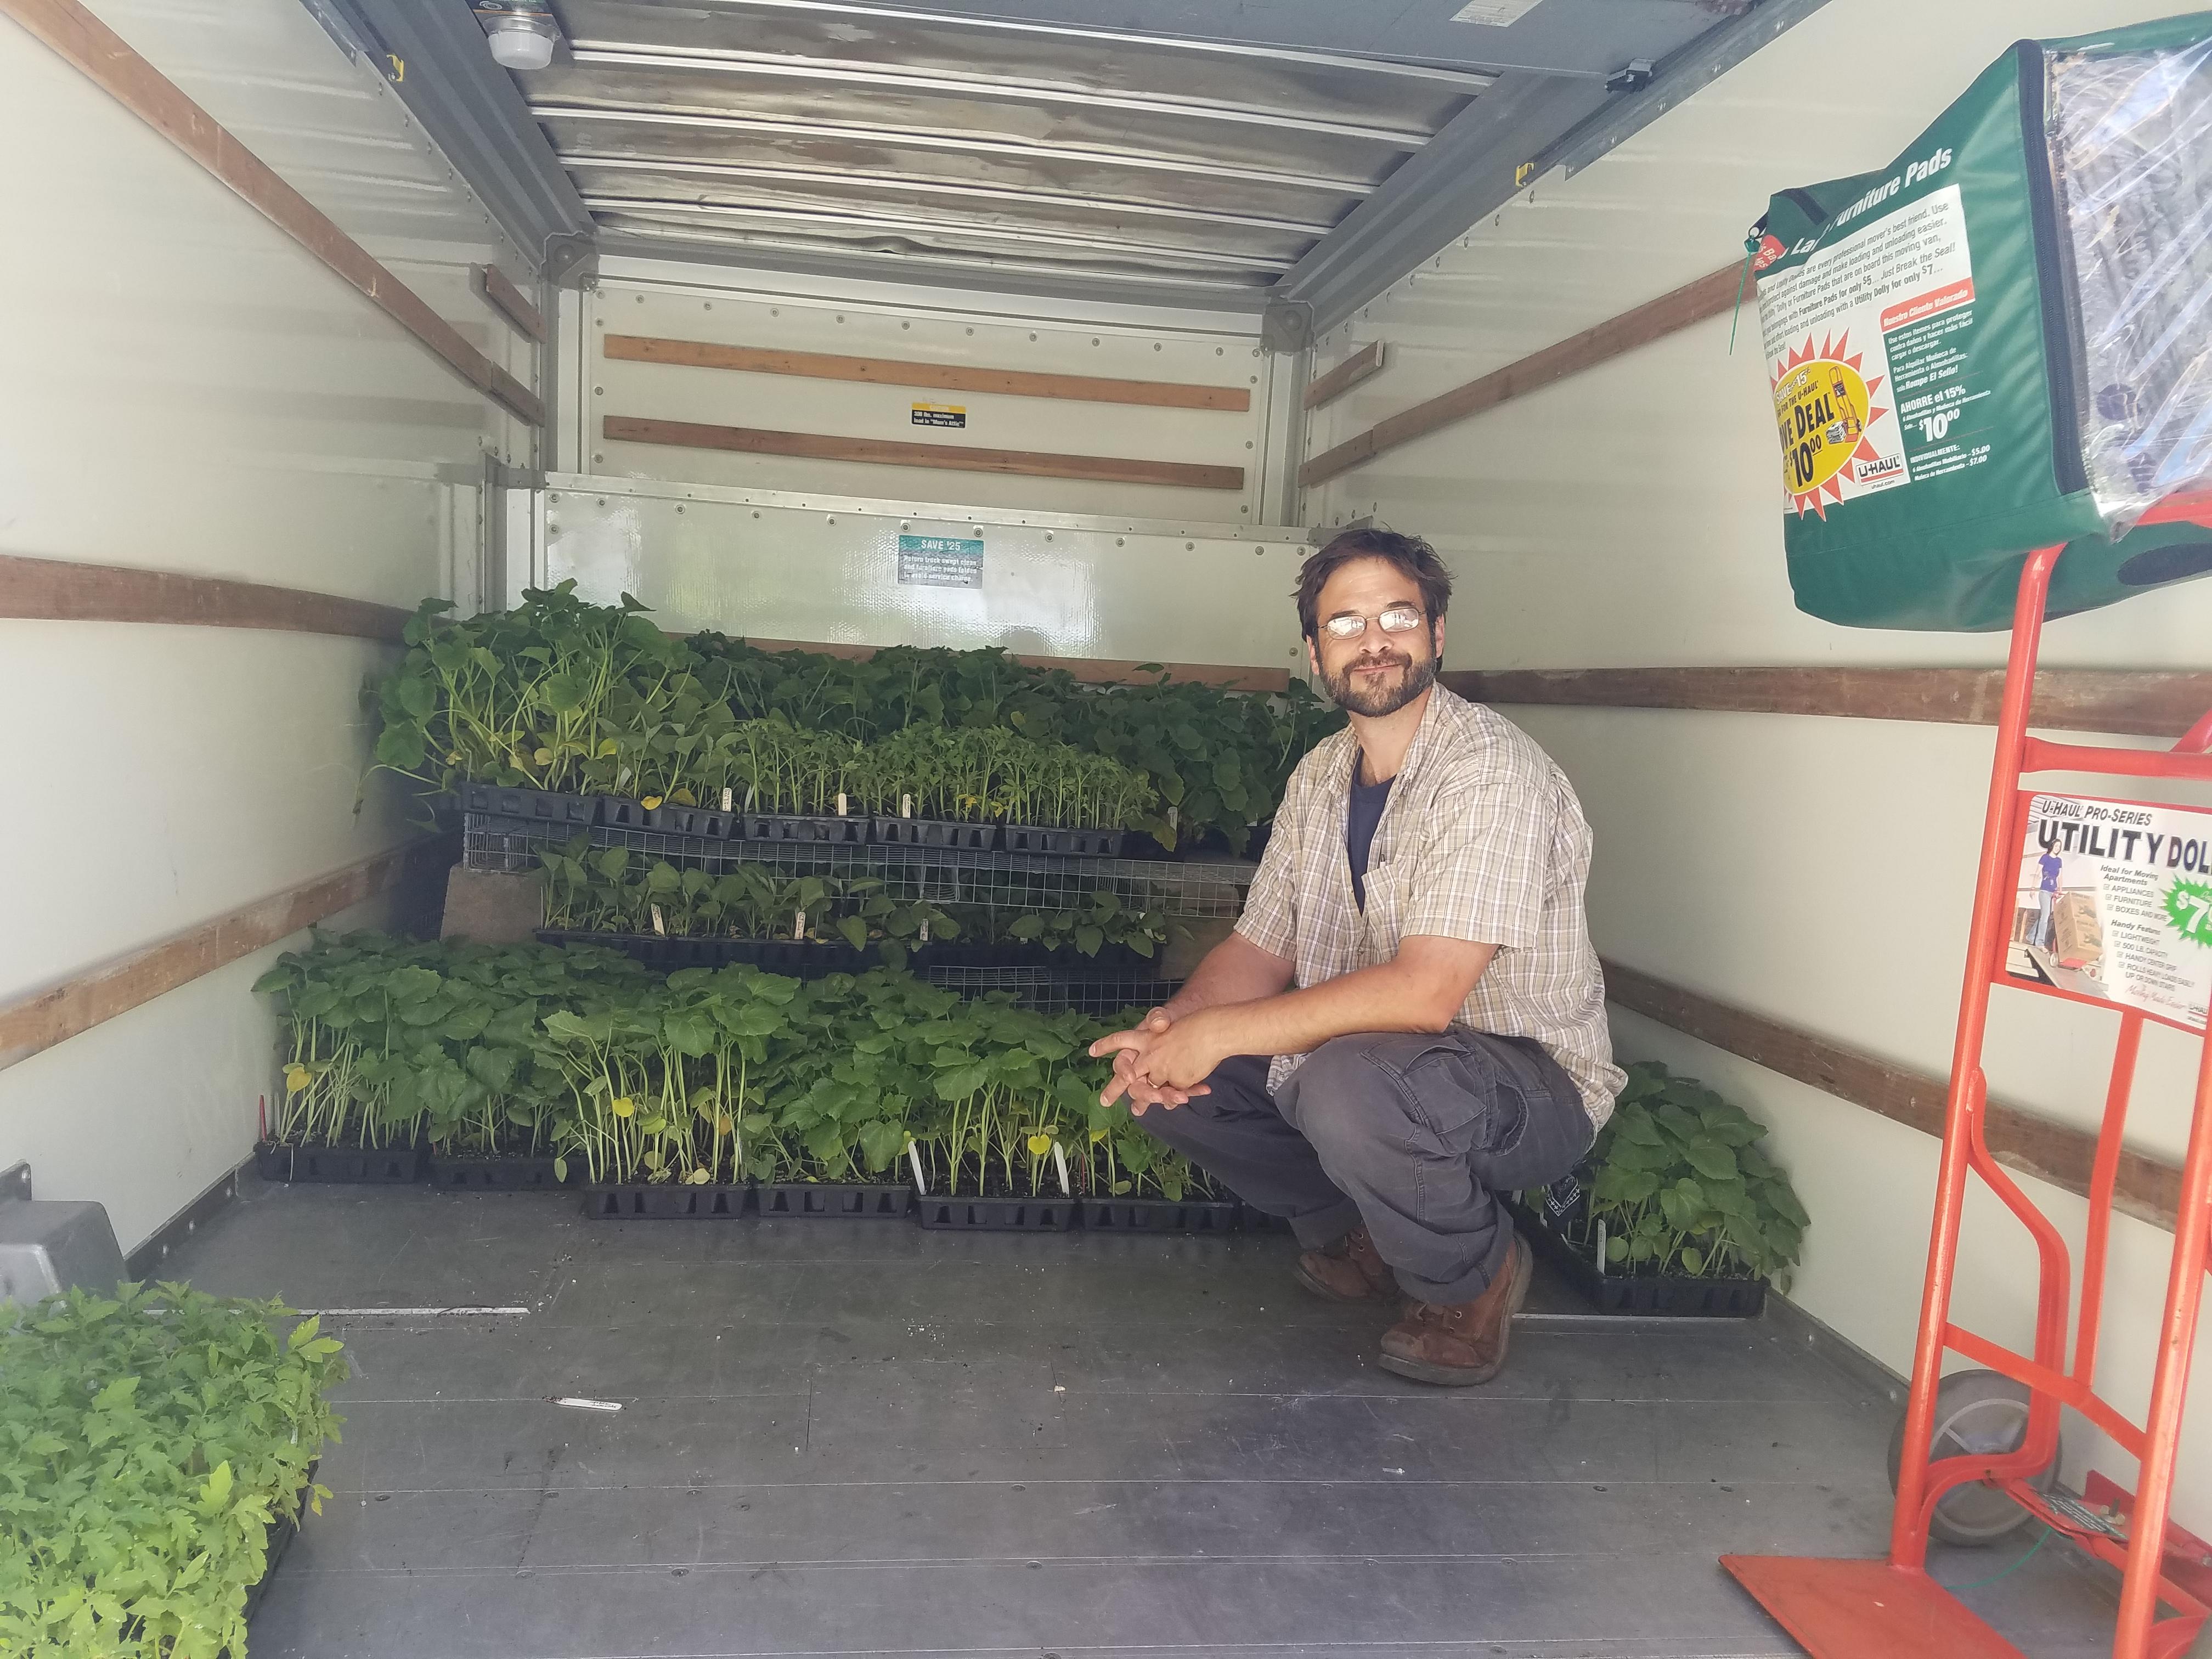 Jonathan plants